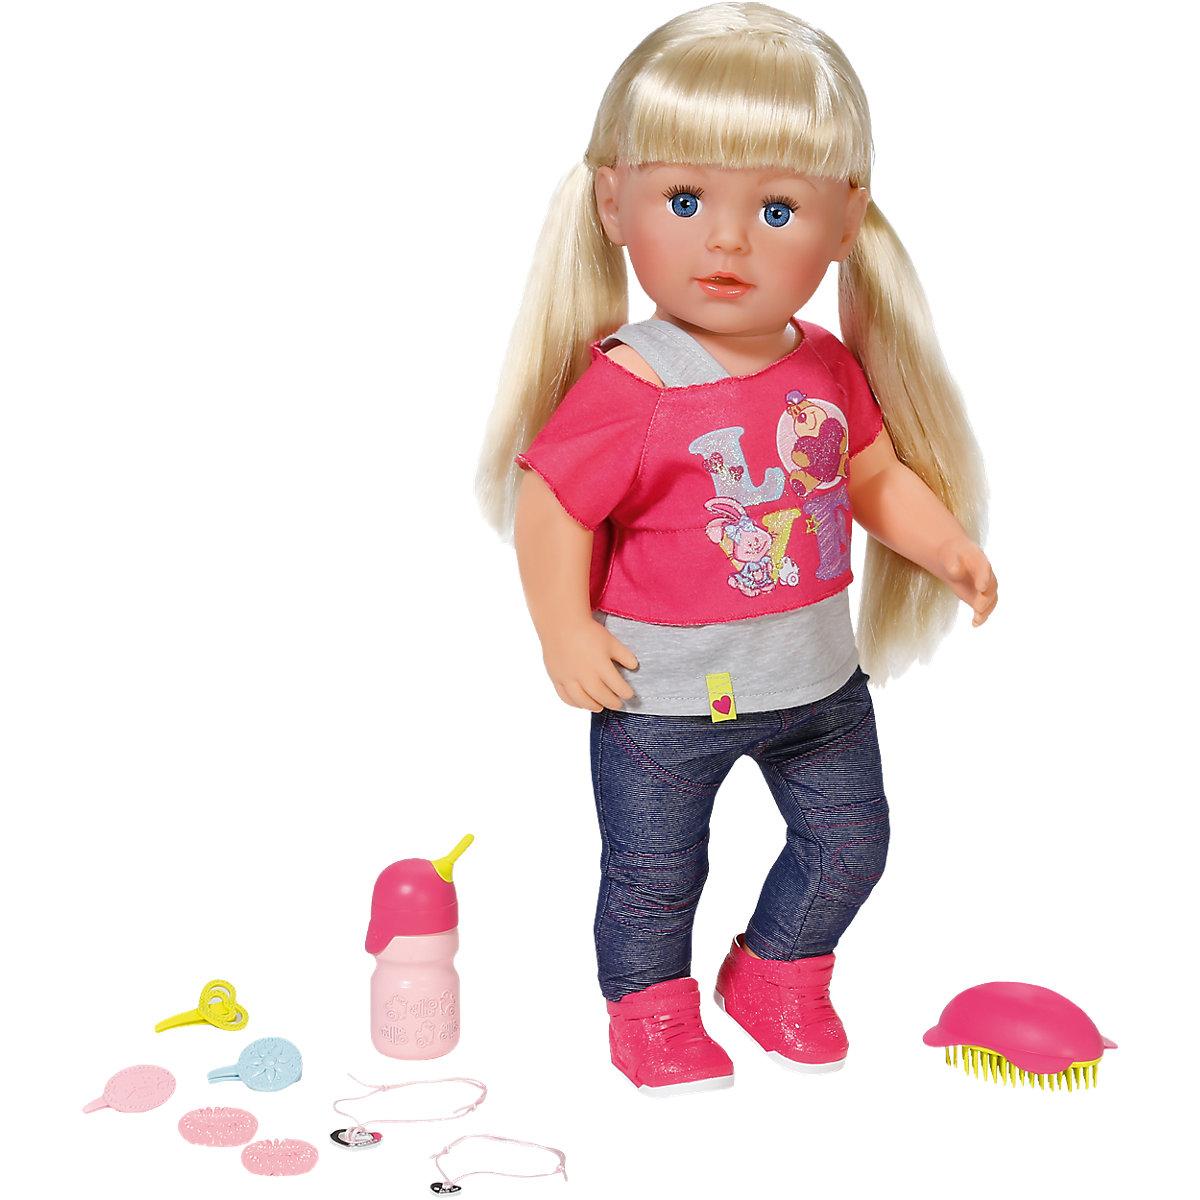 Купить Интерактивная кукла Беби Бон Сестричка, 43 см, Zapf Creation